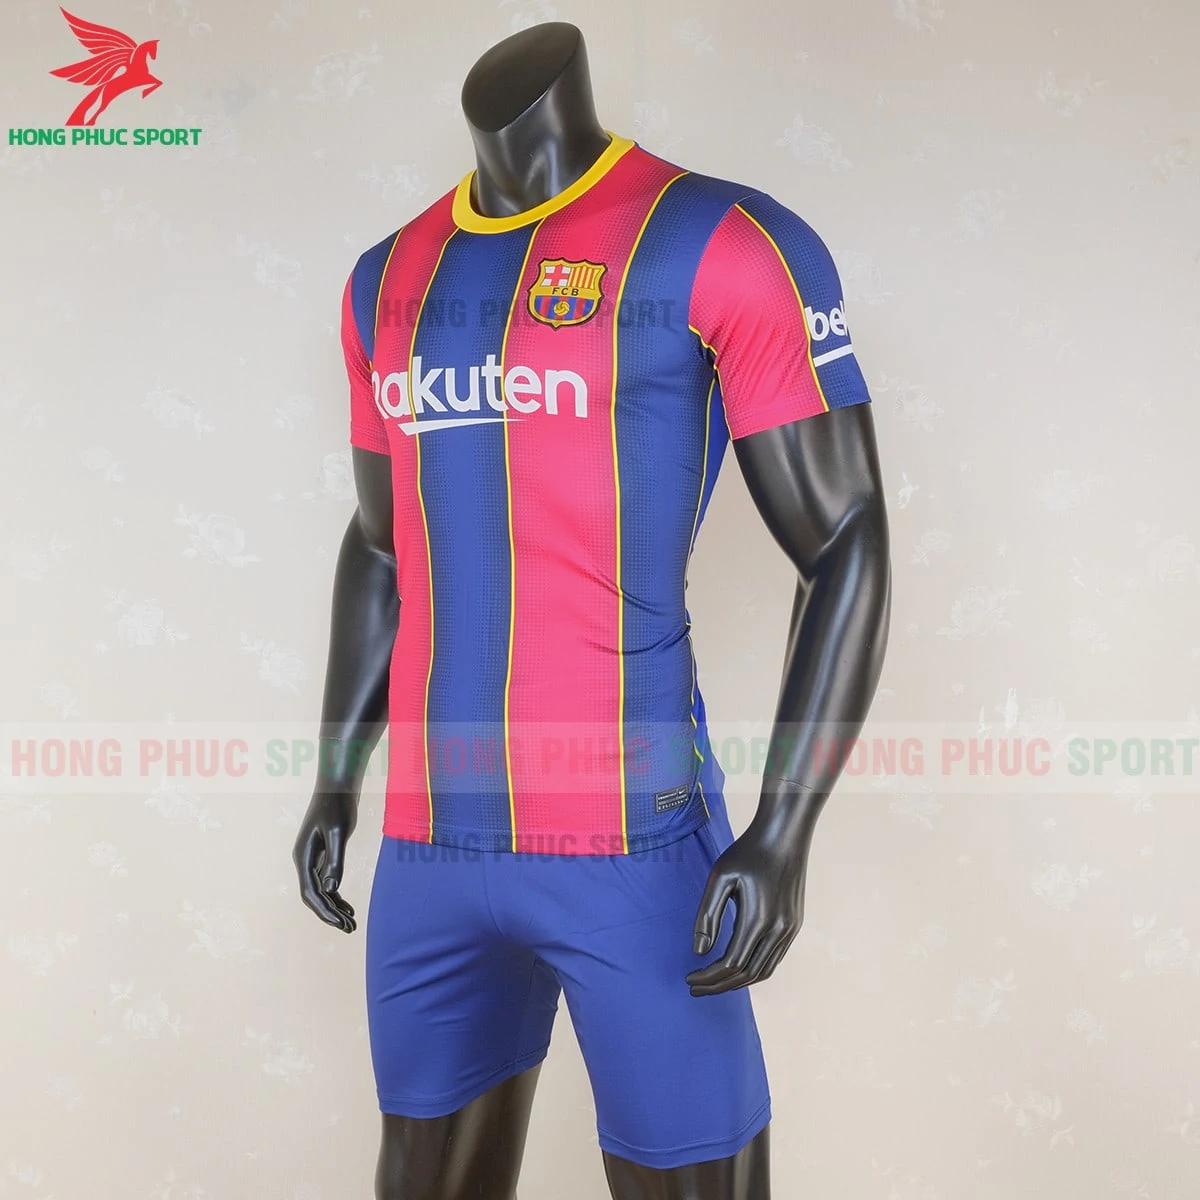 https://cdn.hongphucsport.com/unsafe/s4.shopbay.vn/files/285/ao-barcelona-2020-san-nha-hang-thailand-3-5f7305bcbcc5e.png